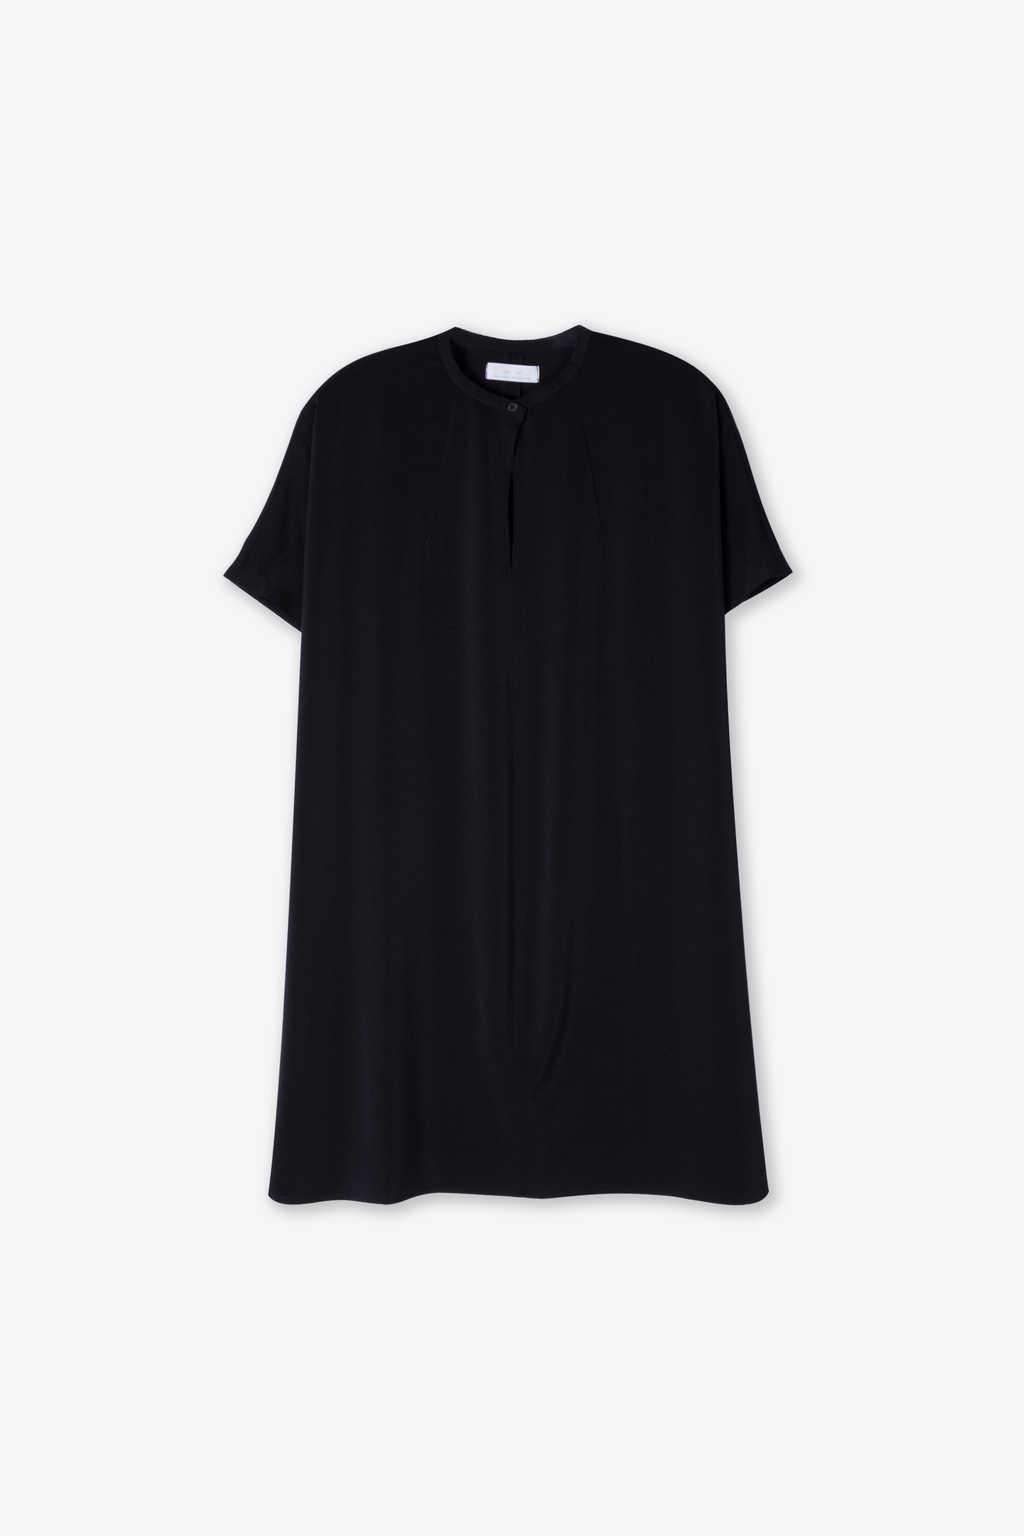 Dress 2723 Black 13